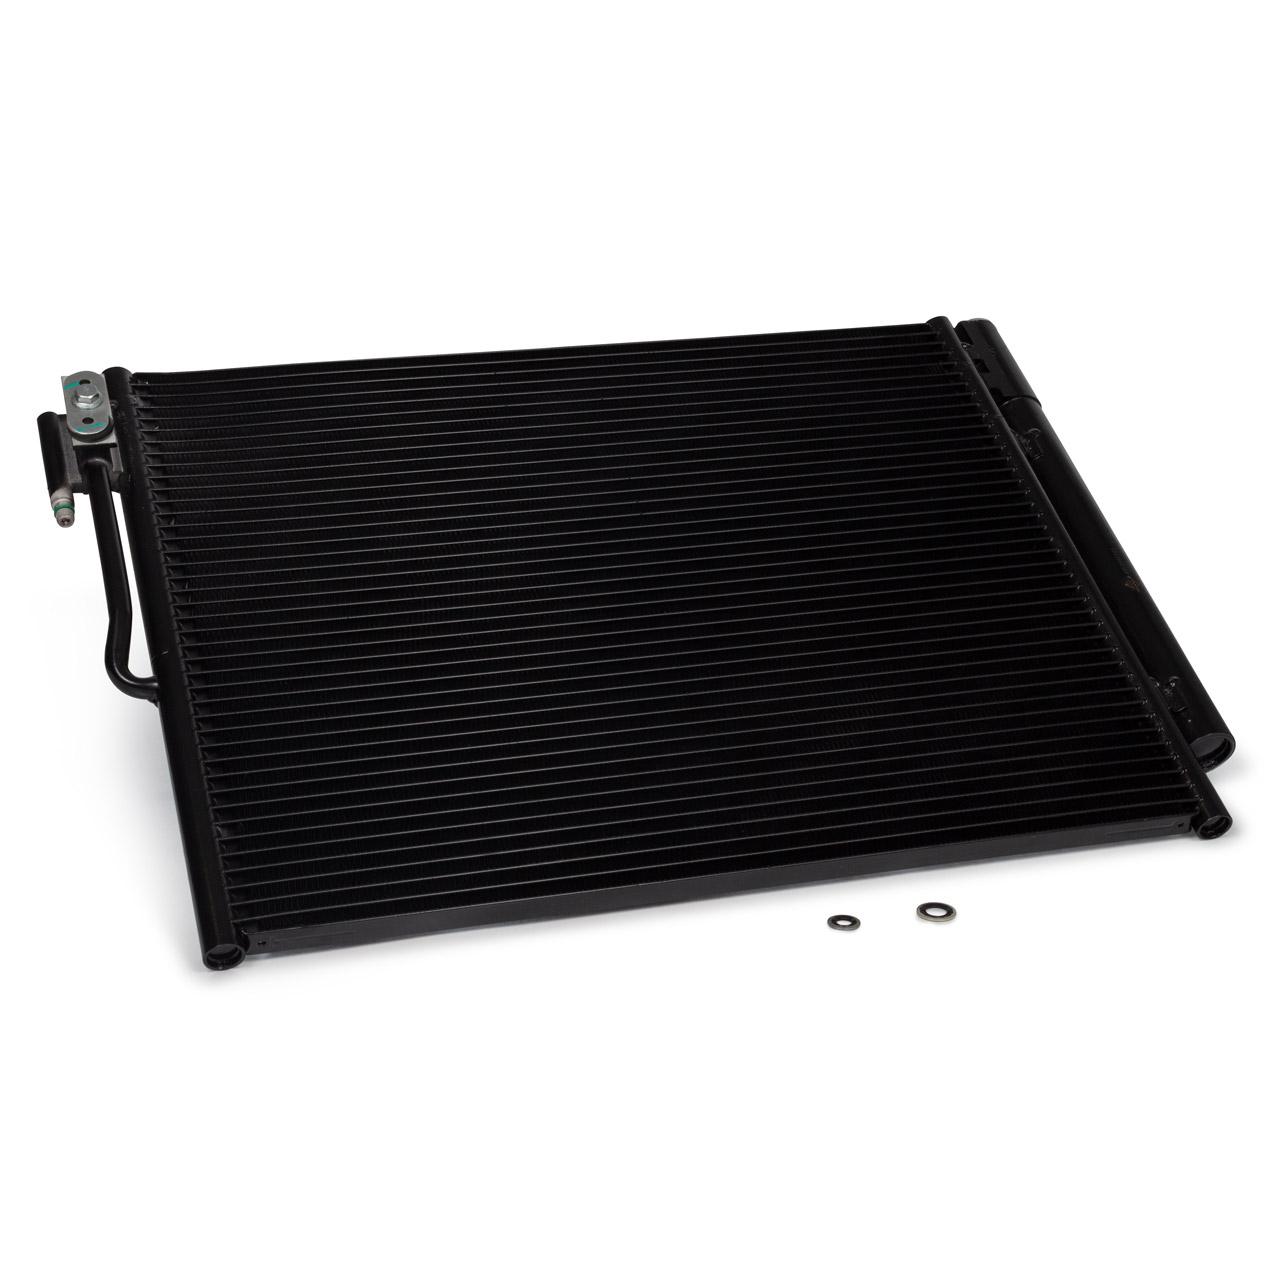 NRF 350053 Kondensator Klimaanlage EASY FIT für OPEL Meriva B 1.3/1.7 CDTI 1.4 / LPG